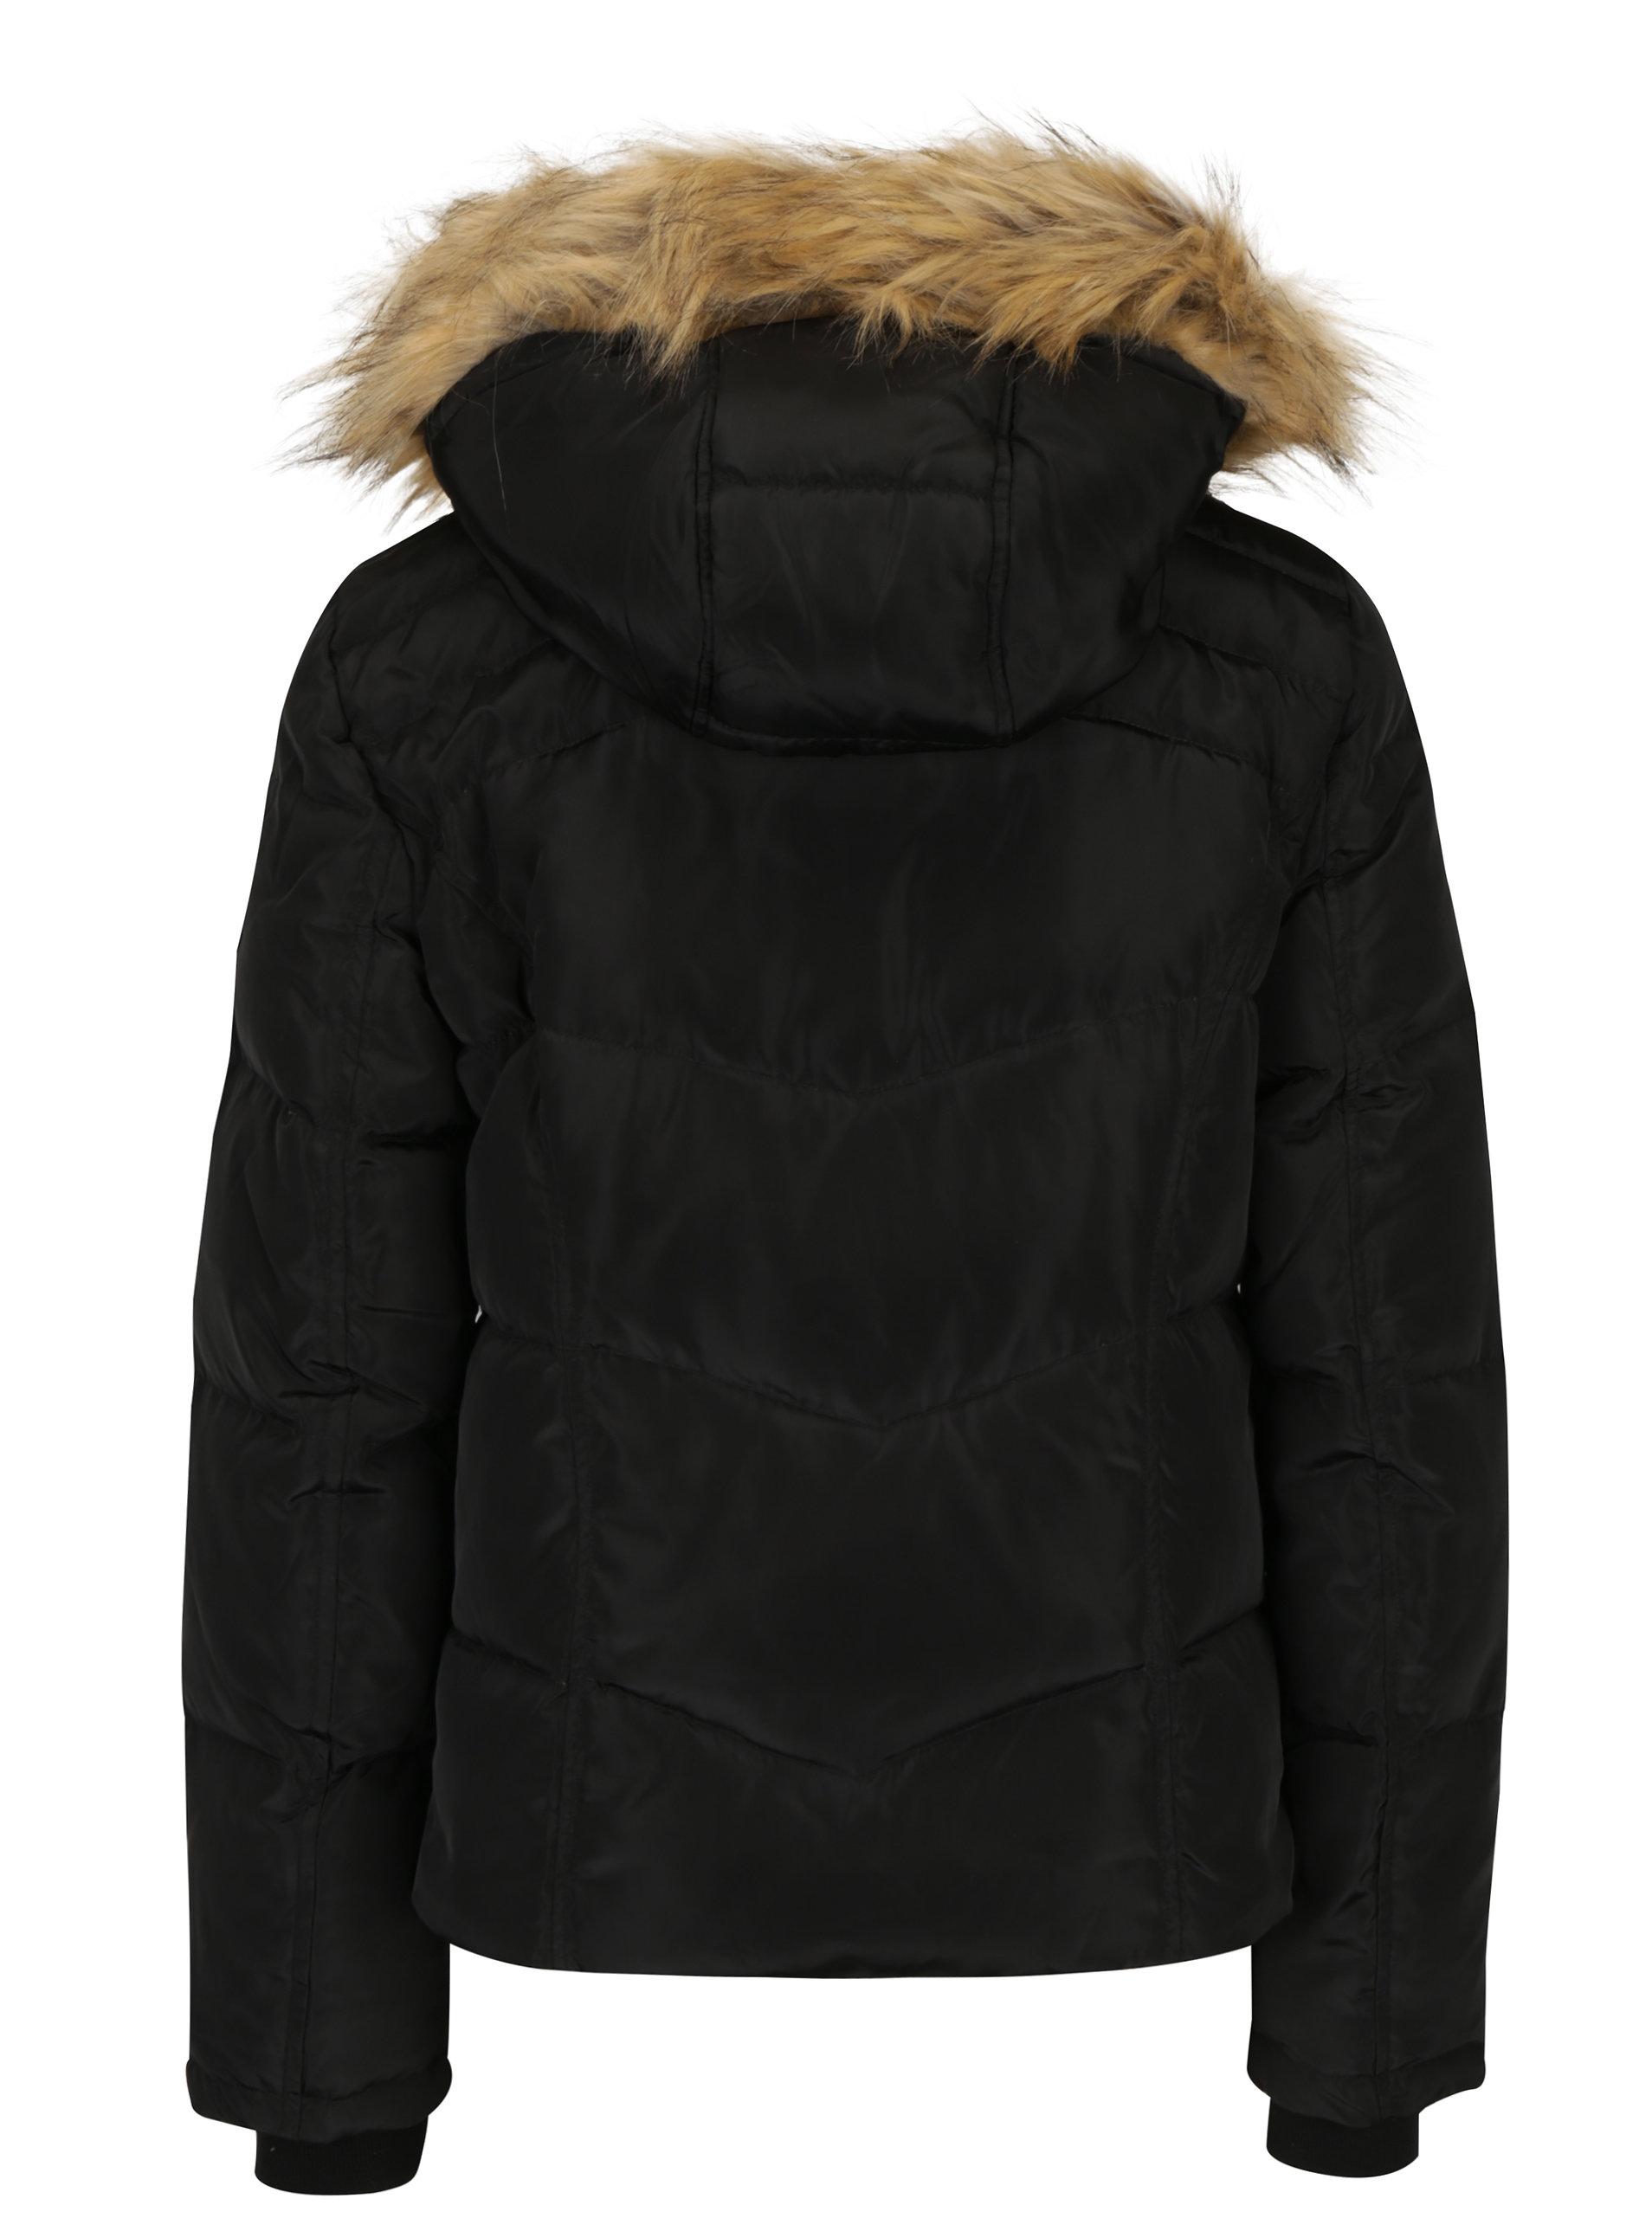 1c90a7caab99 Čierna zimná prešívaná bunda s kapucňou VERO MODA Fea ...